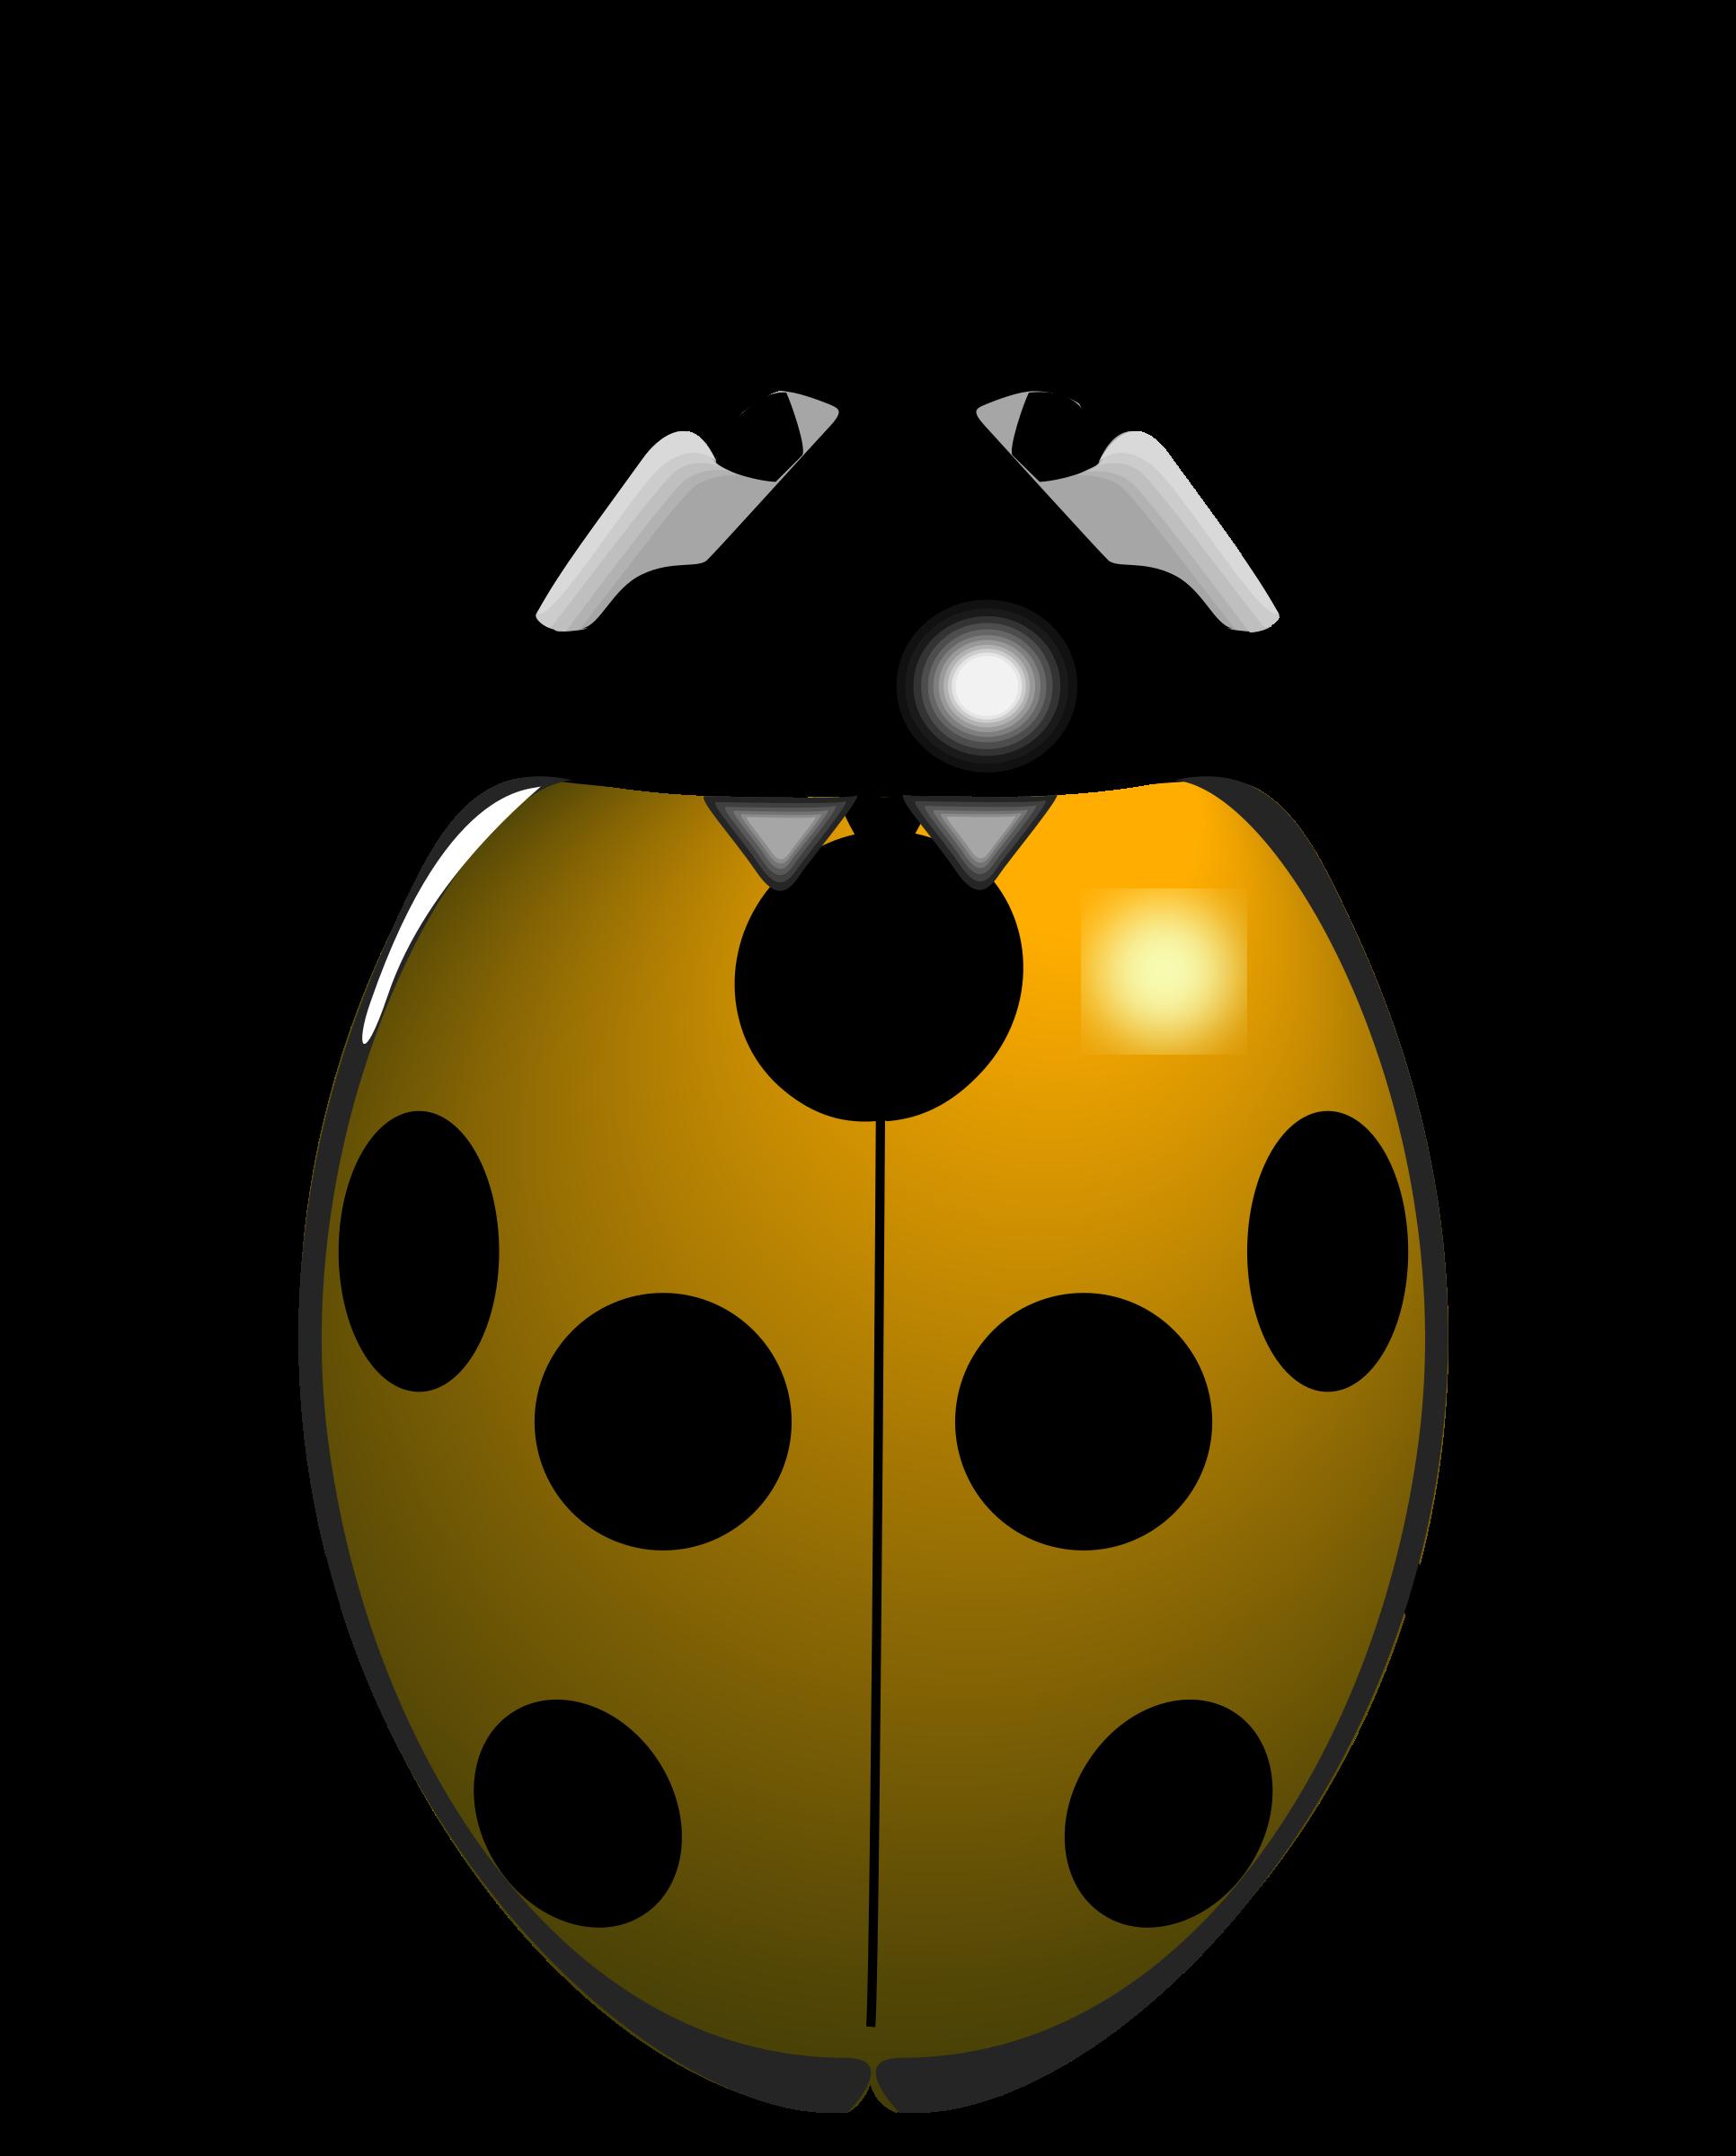 Coloring phenomenal image ideas. Free ladybug clipart downloads